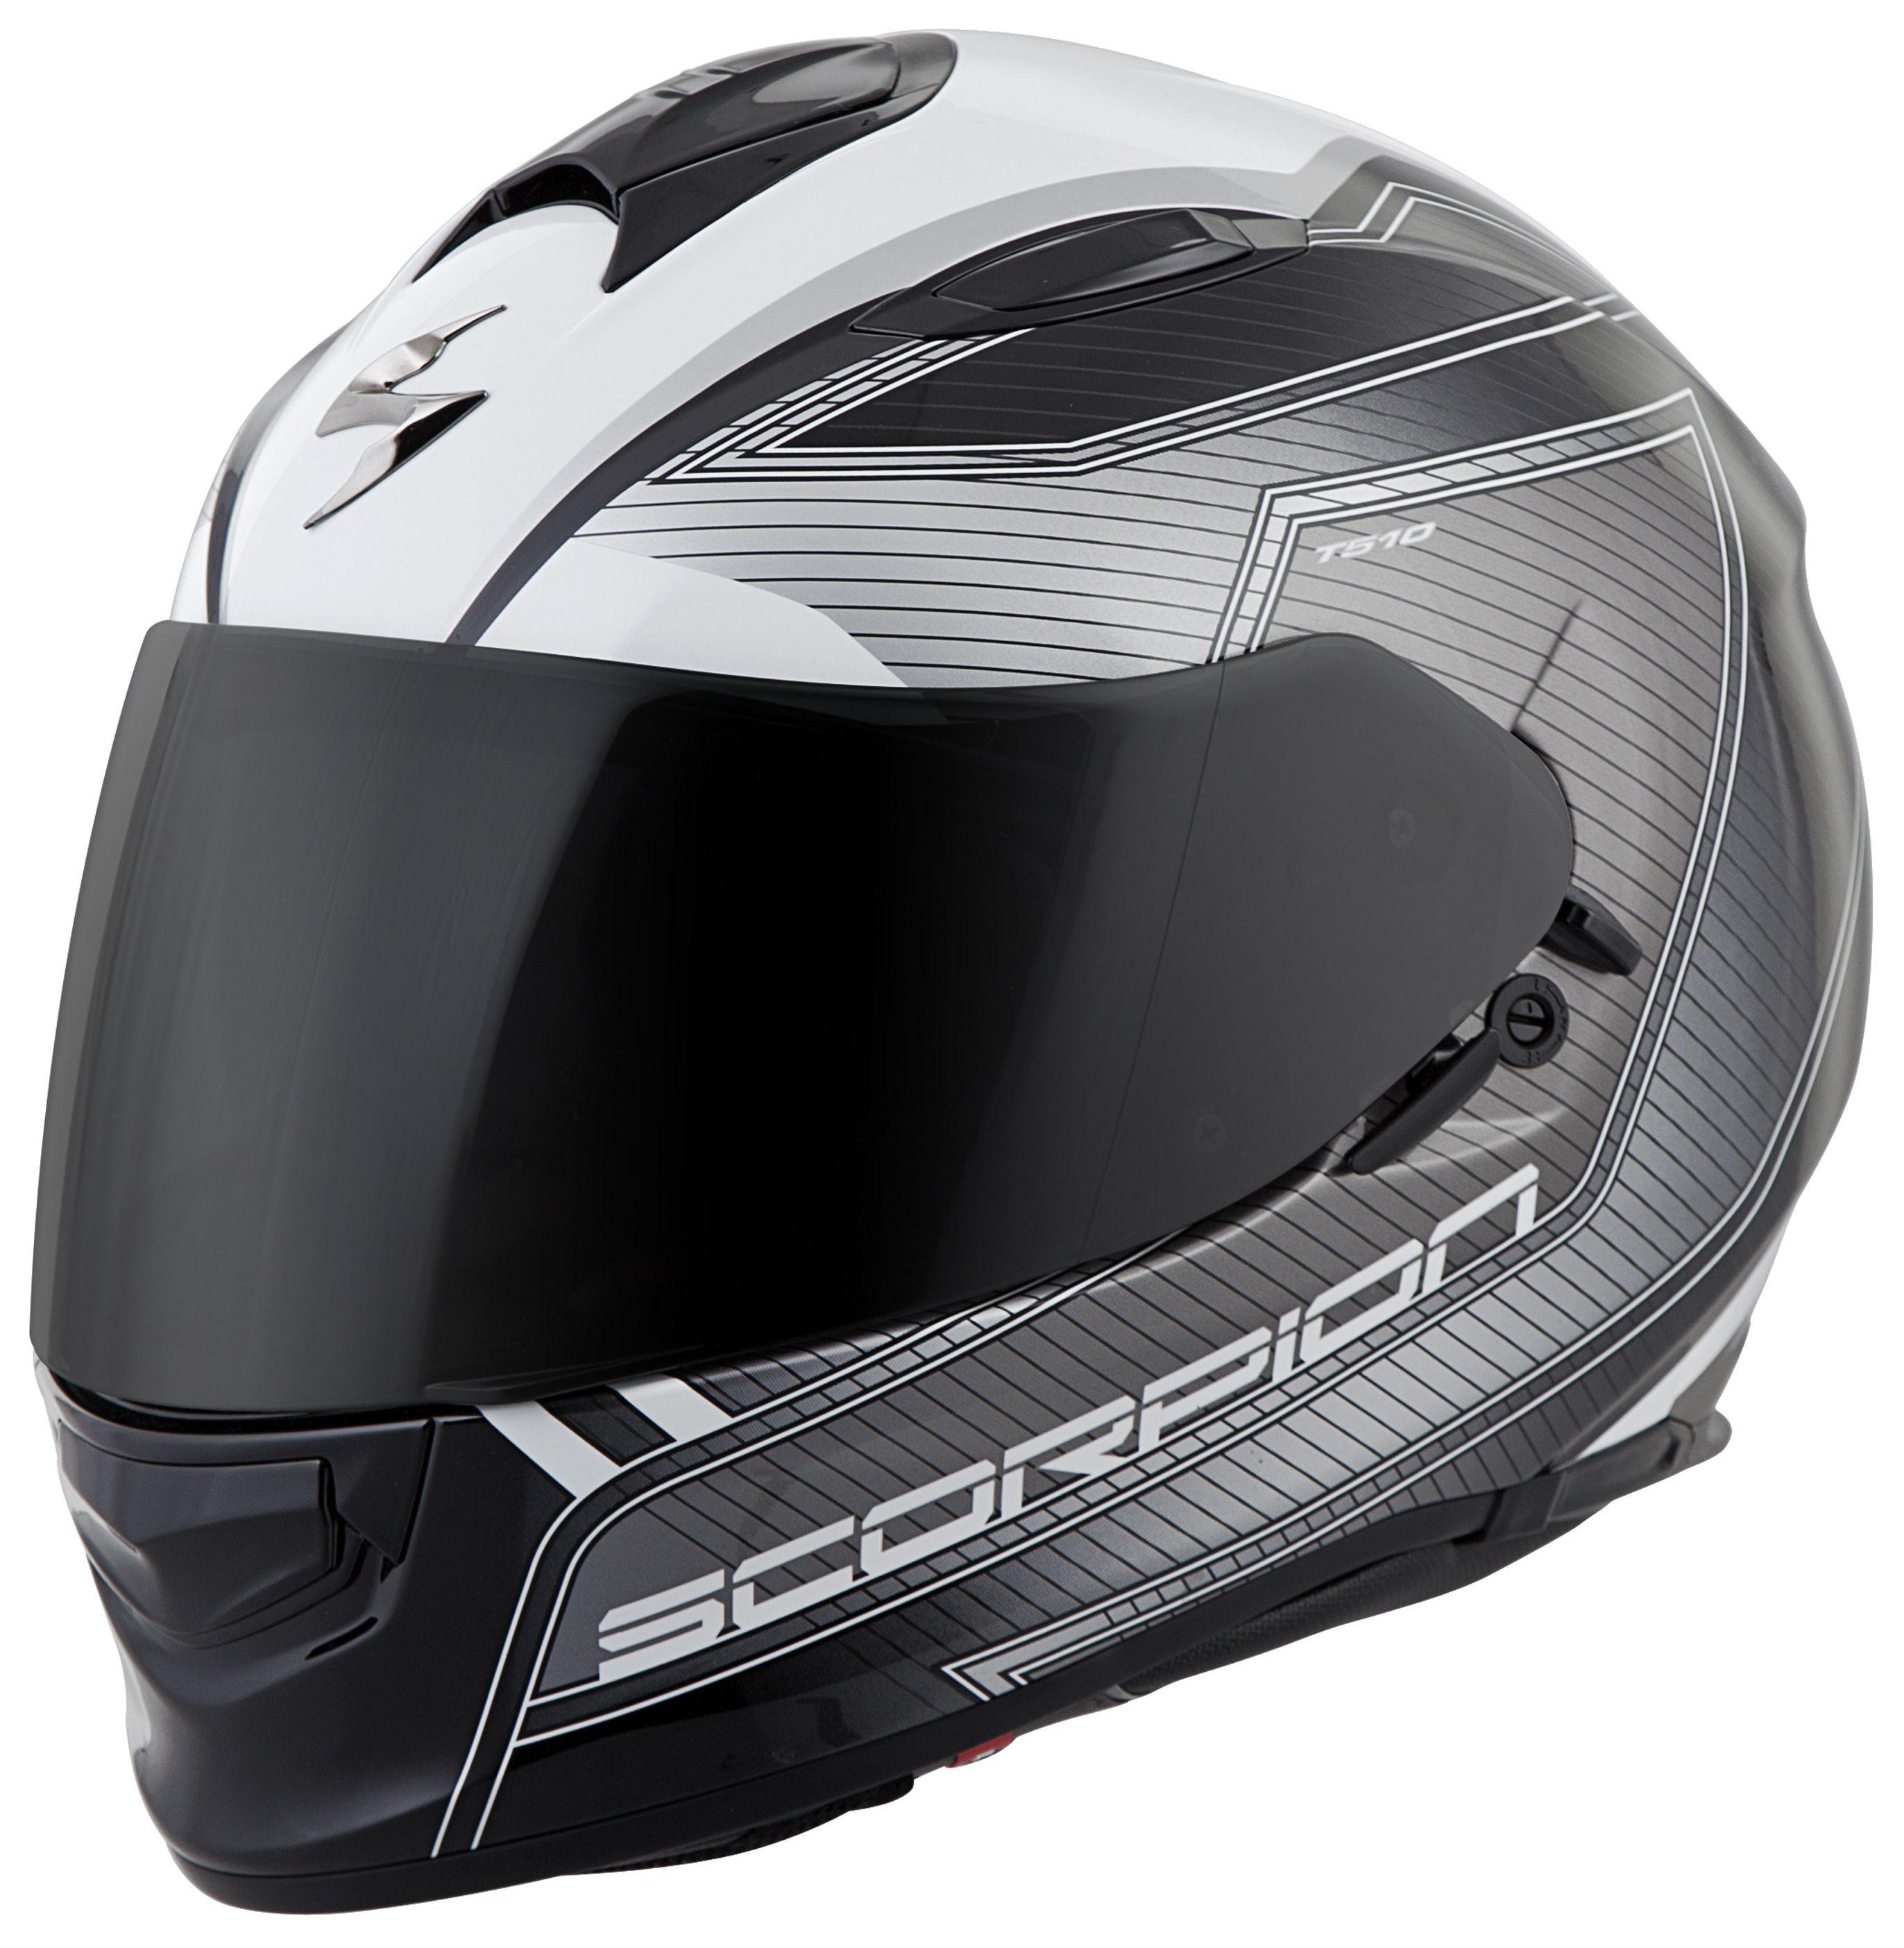 scorpion exo t510 nexus helmet revzilla. Black Bedroom Furniture Sets. Home Design Ideas